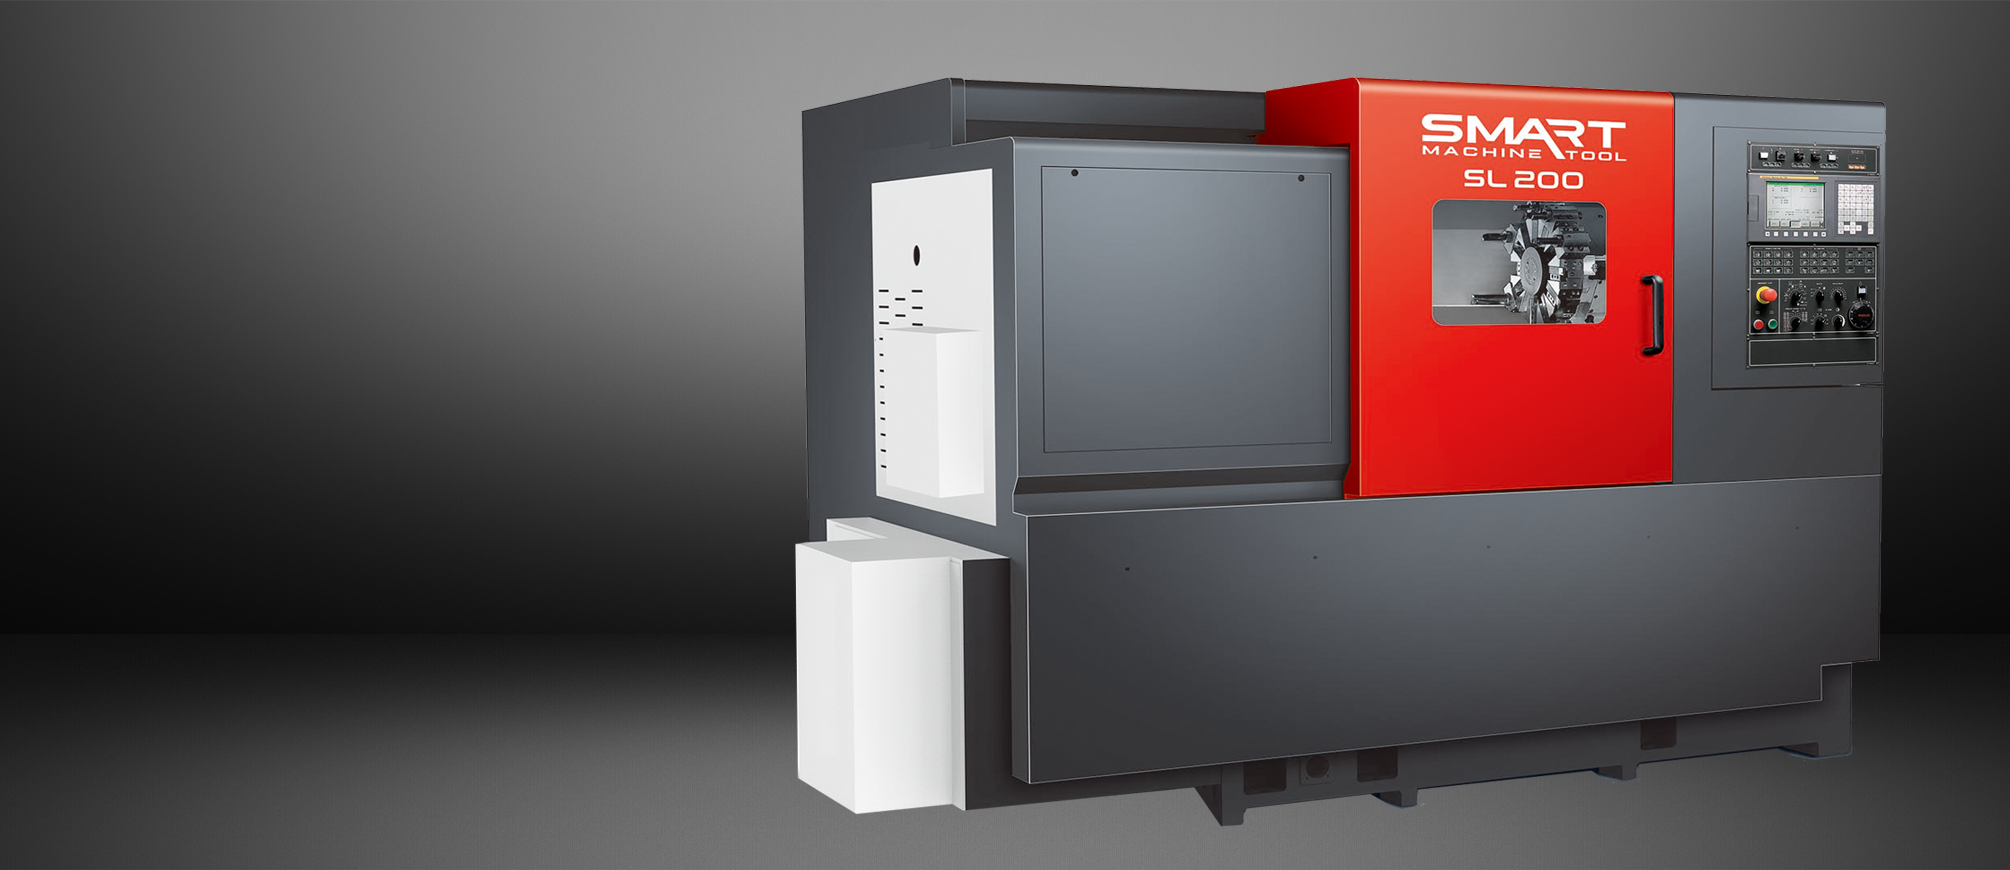 "SMART SL 200 – BOX WAY – (8"" CHUCK) 2-Axis CNC Lathes"